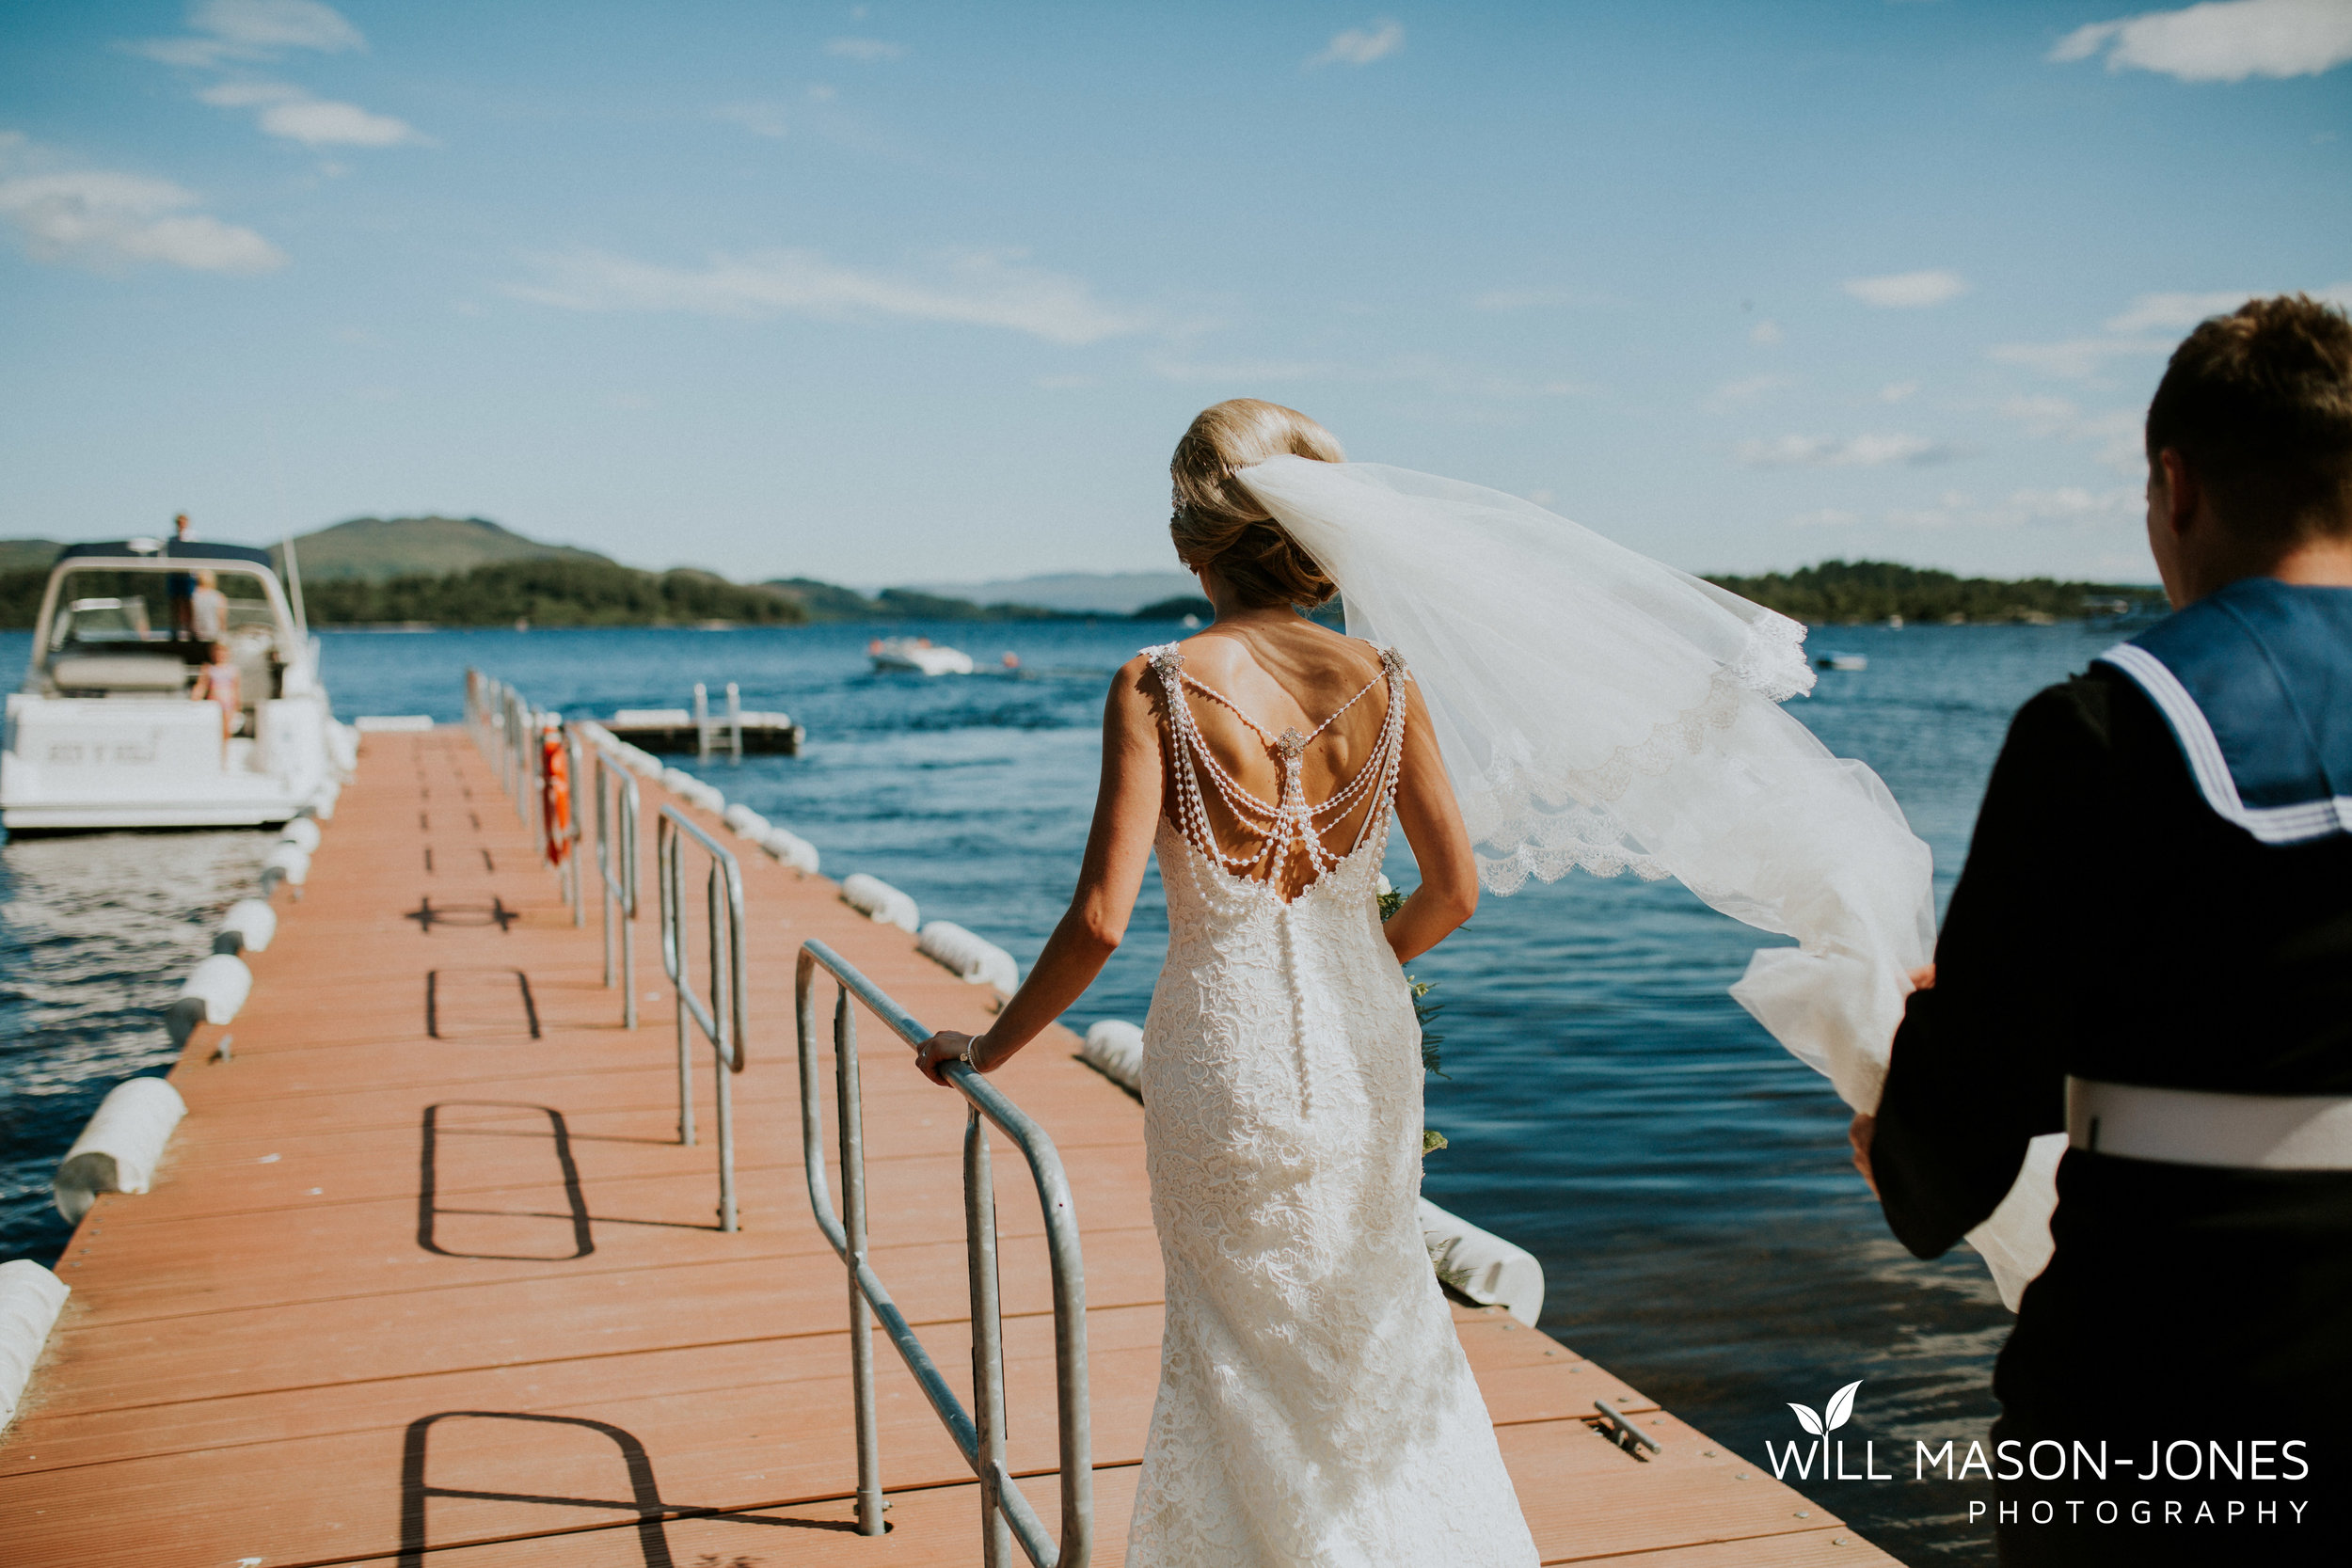 loch-lomond-destination-wedding-photographer-scotland-uk-wales-47.jpg